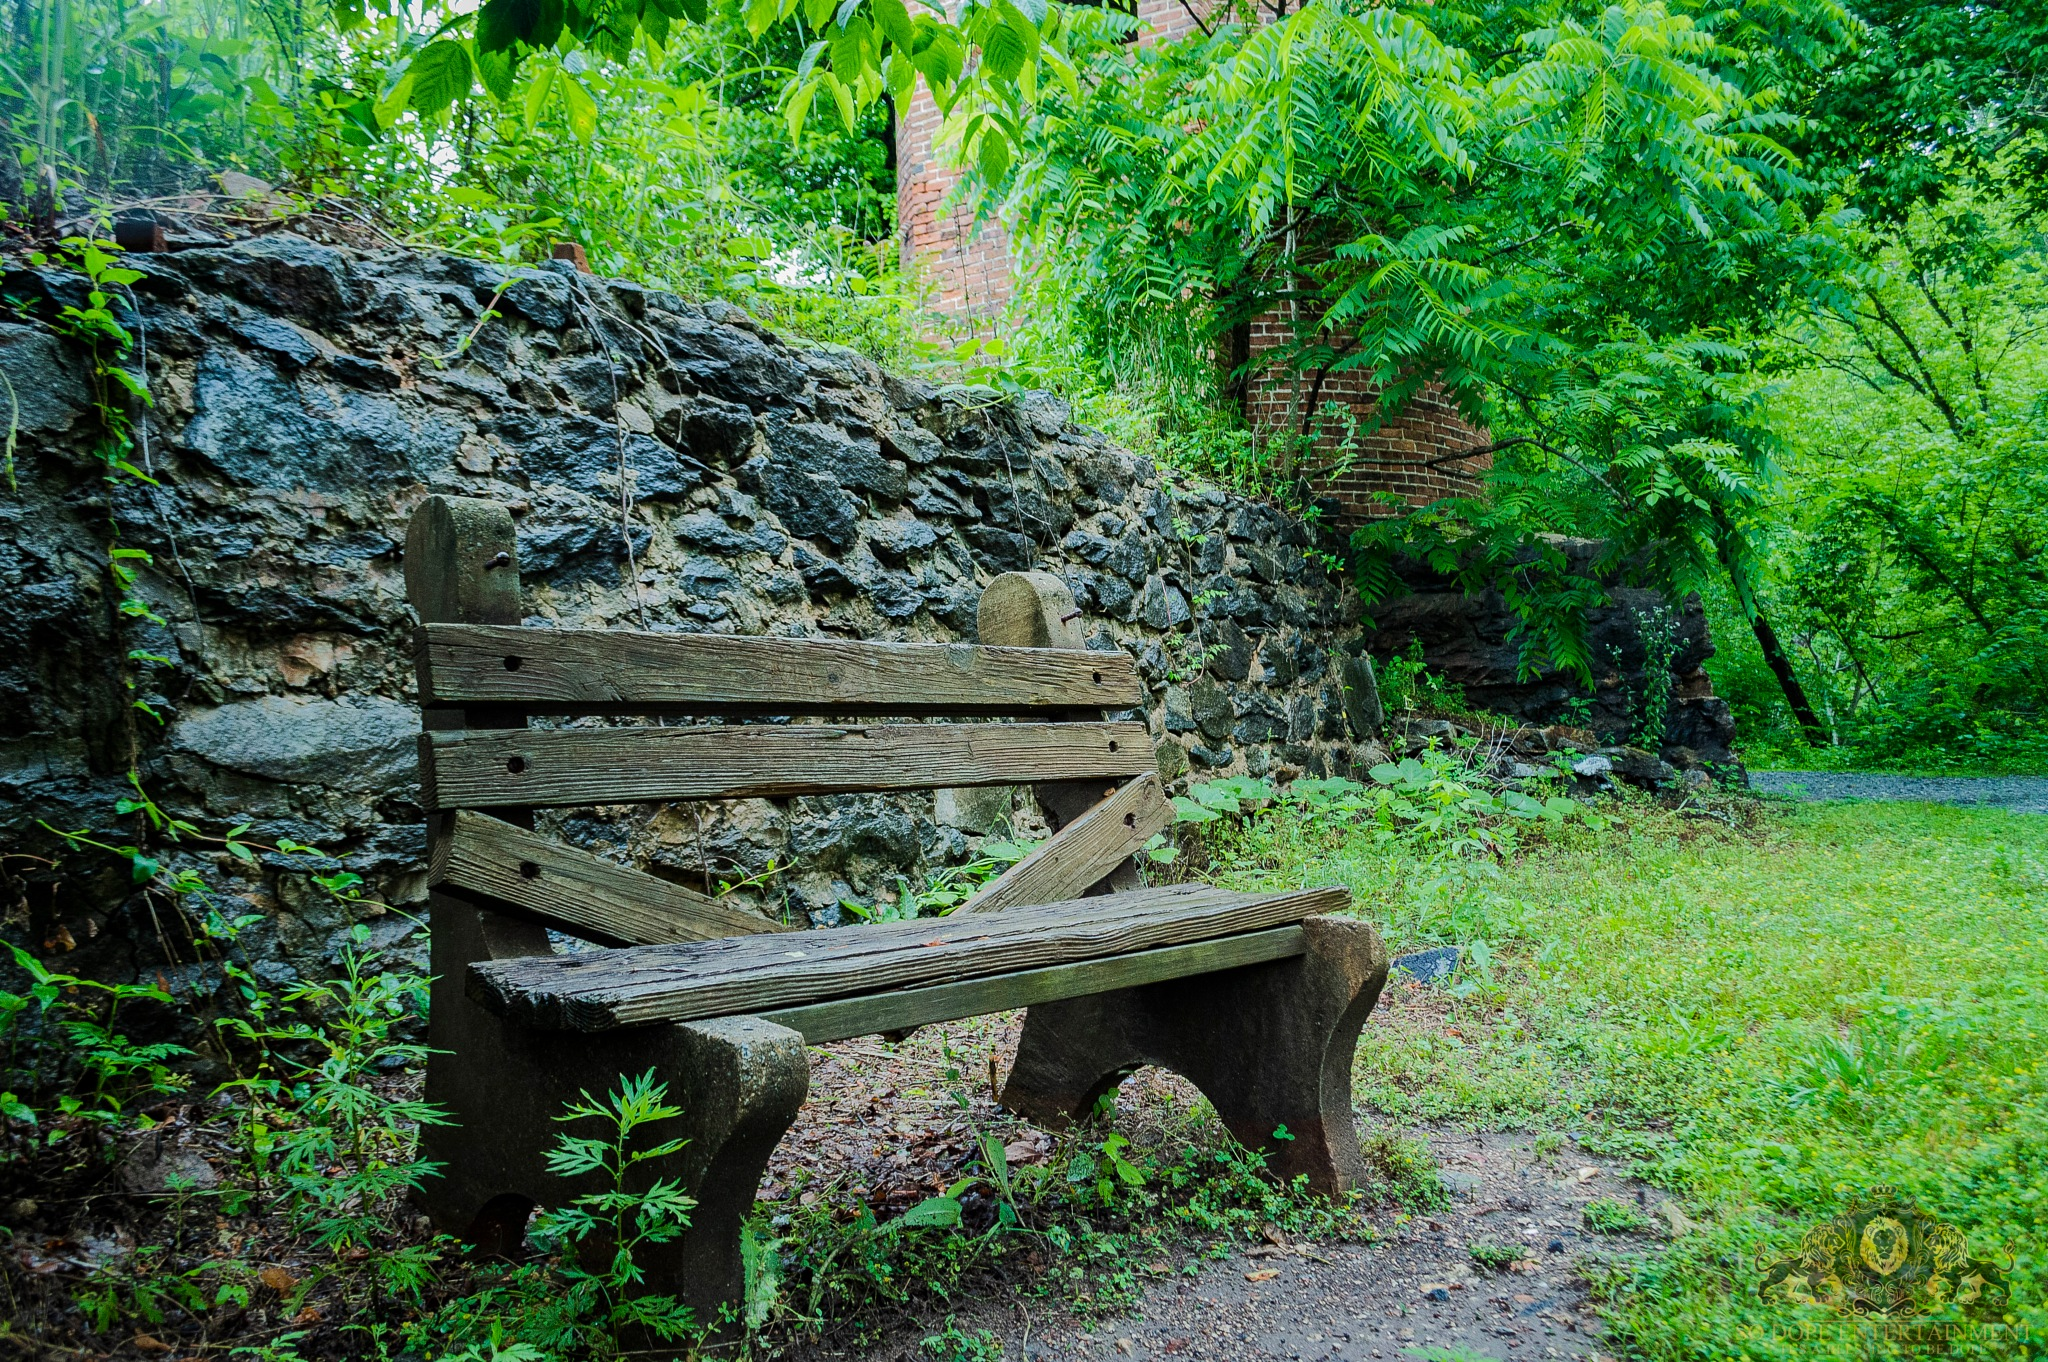 Broken Bench by Antonio Byrd